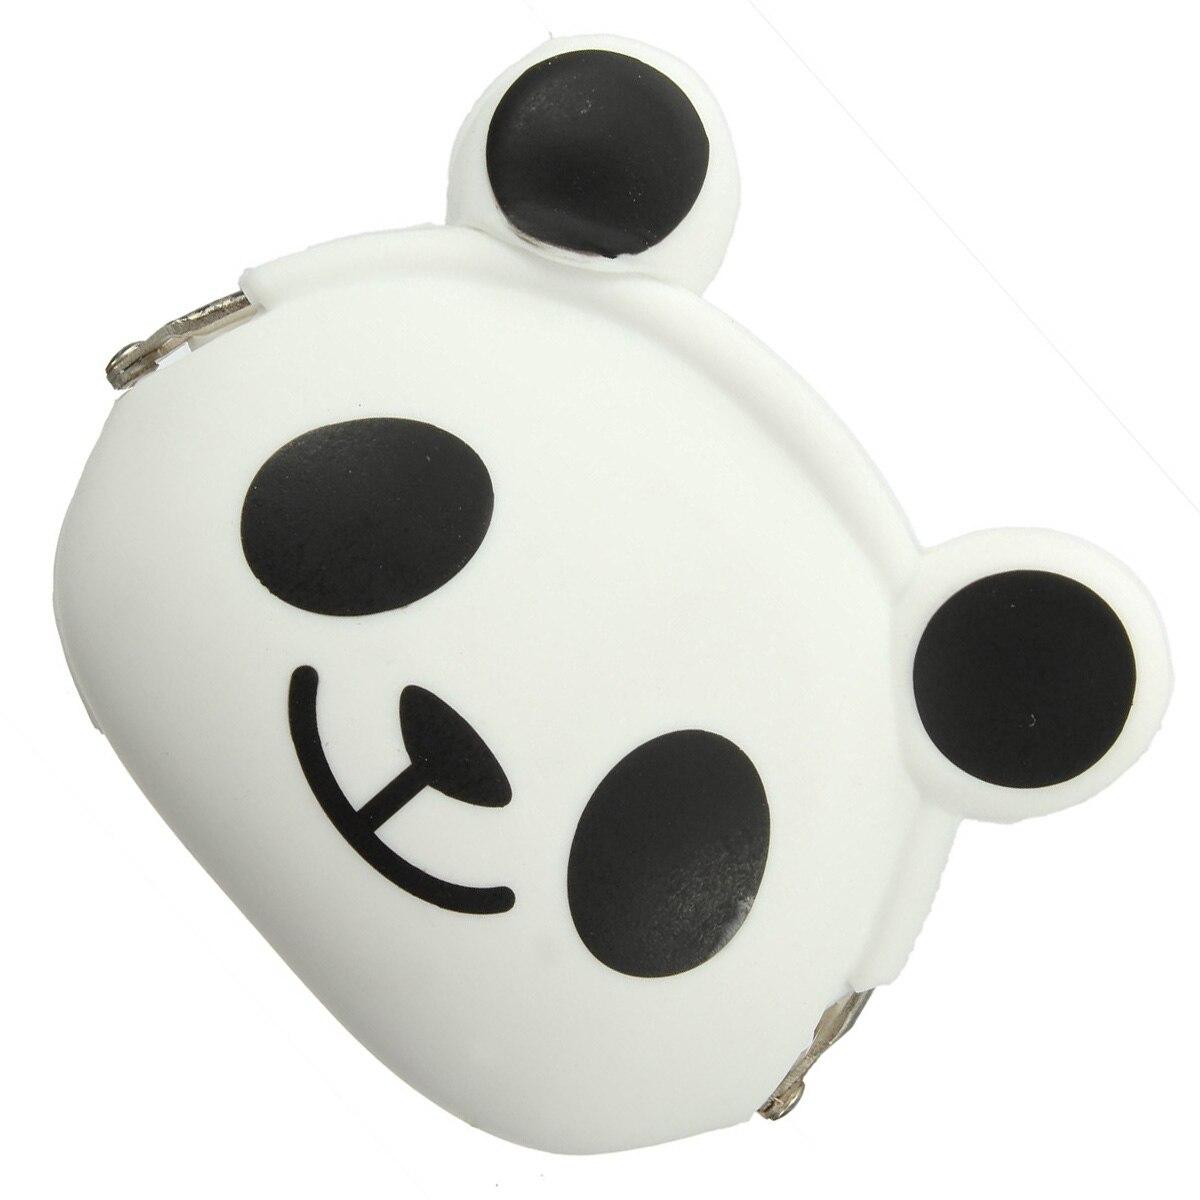 FGGS-Women Girls Wallet Kawaii Cute Cartoon Animal Silicone Jelly Coin Bag Purse Kids Gift Panda